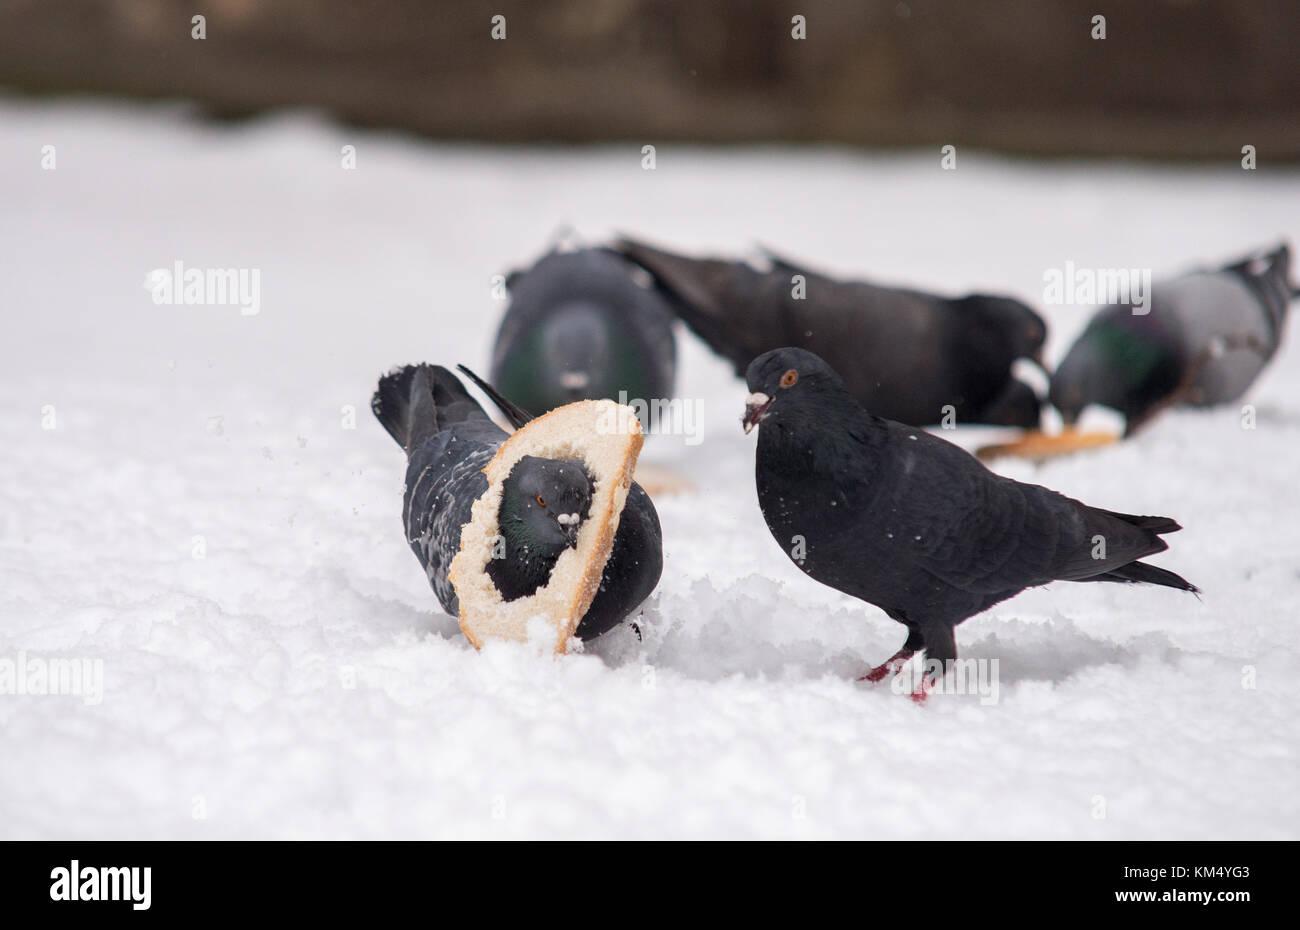 Clsose en dos palomas luchando por alimento en invierno Imagen De Stock